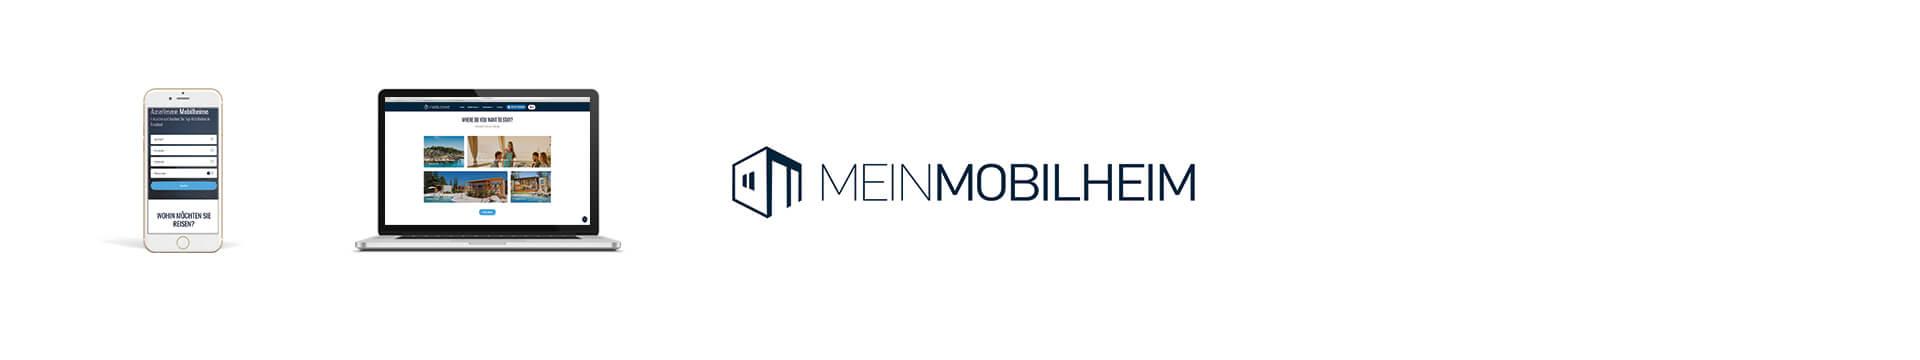 Upoznajte meinmobilheim.de i my-mobilehome.com – nove portale za mobilne kućice